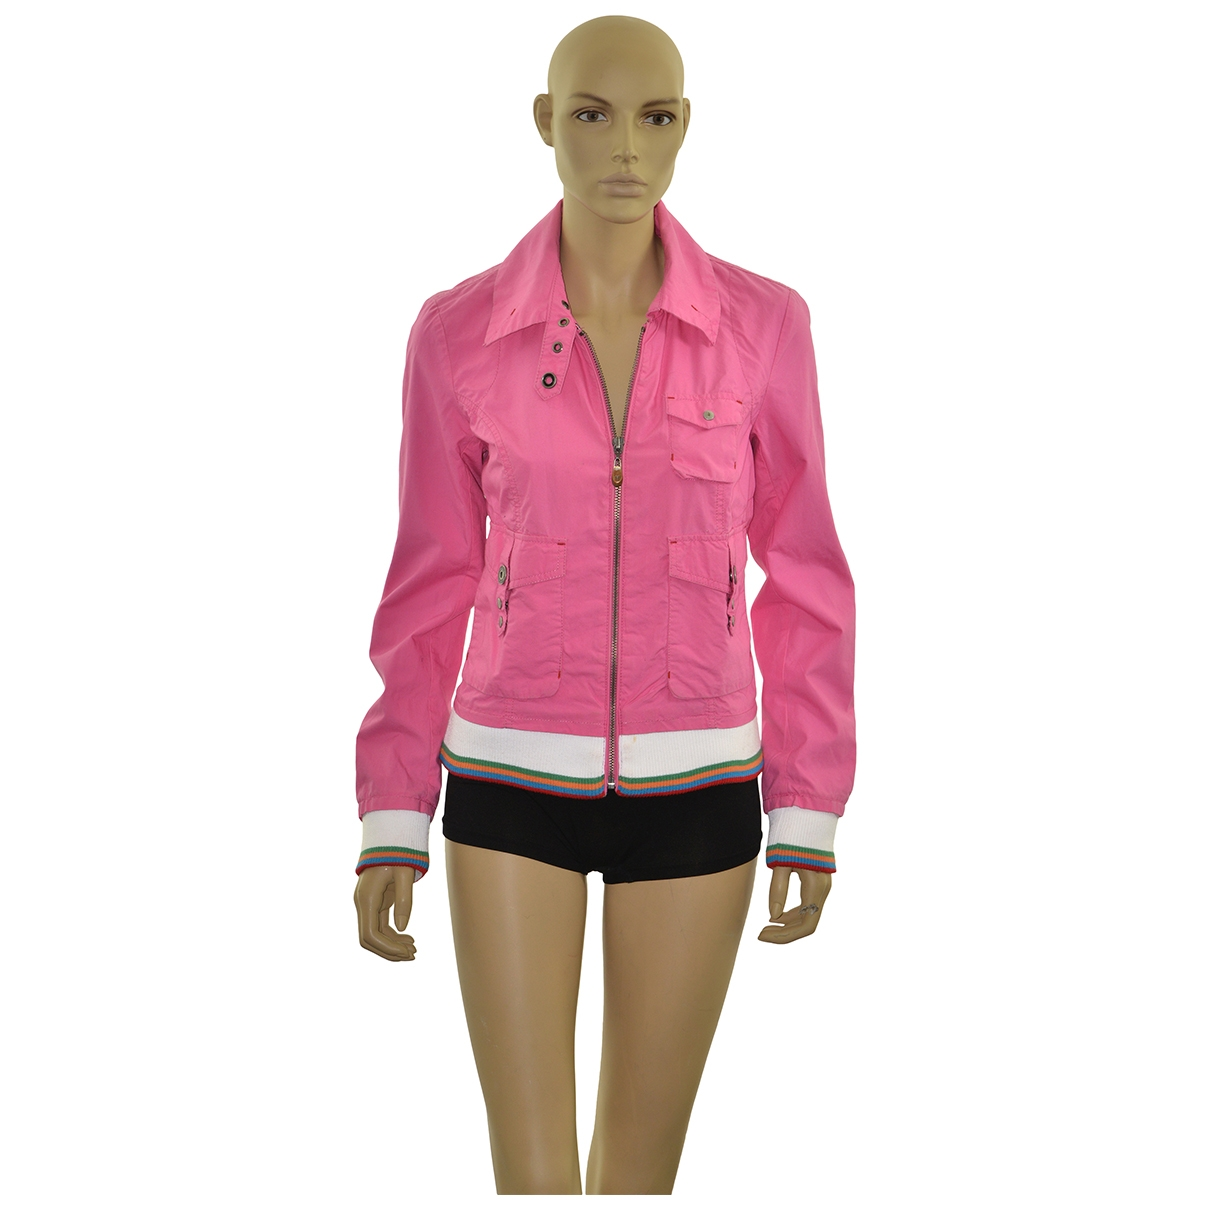 Tommy Hilfiger \N Pink Cotton jacket for Women M International